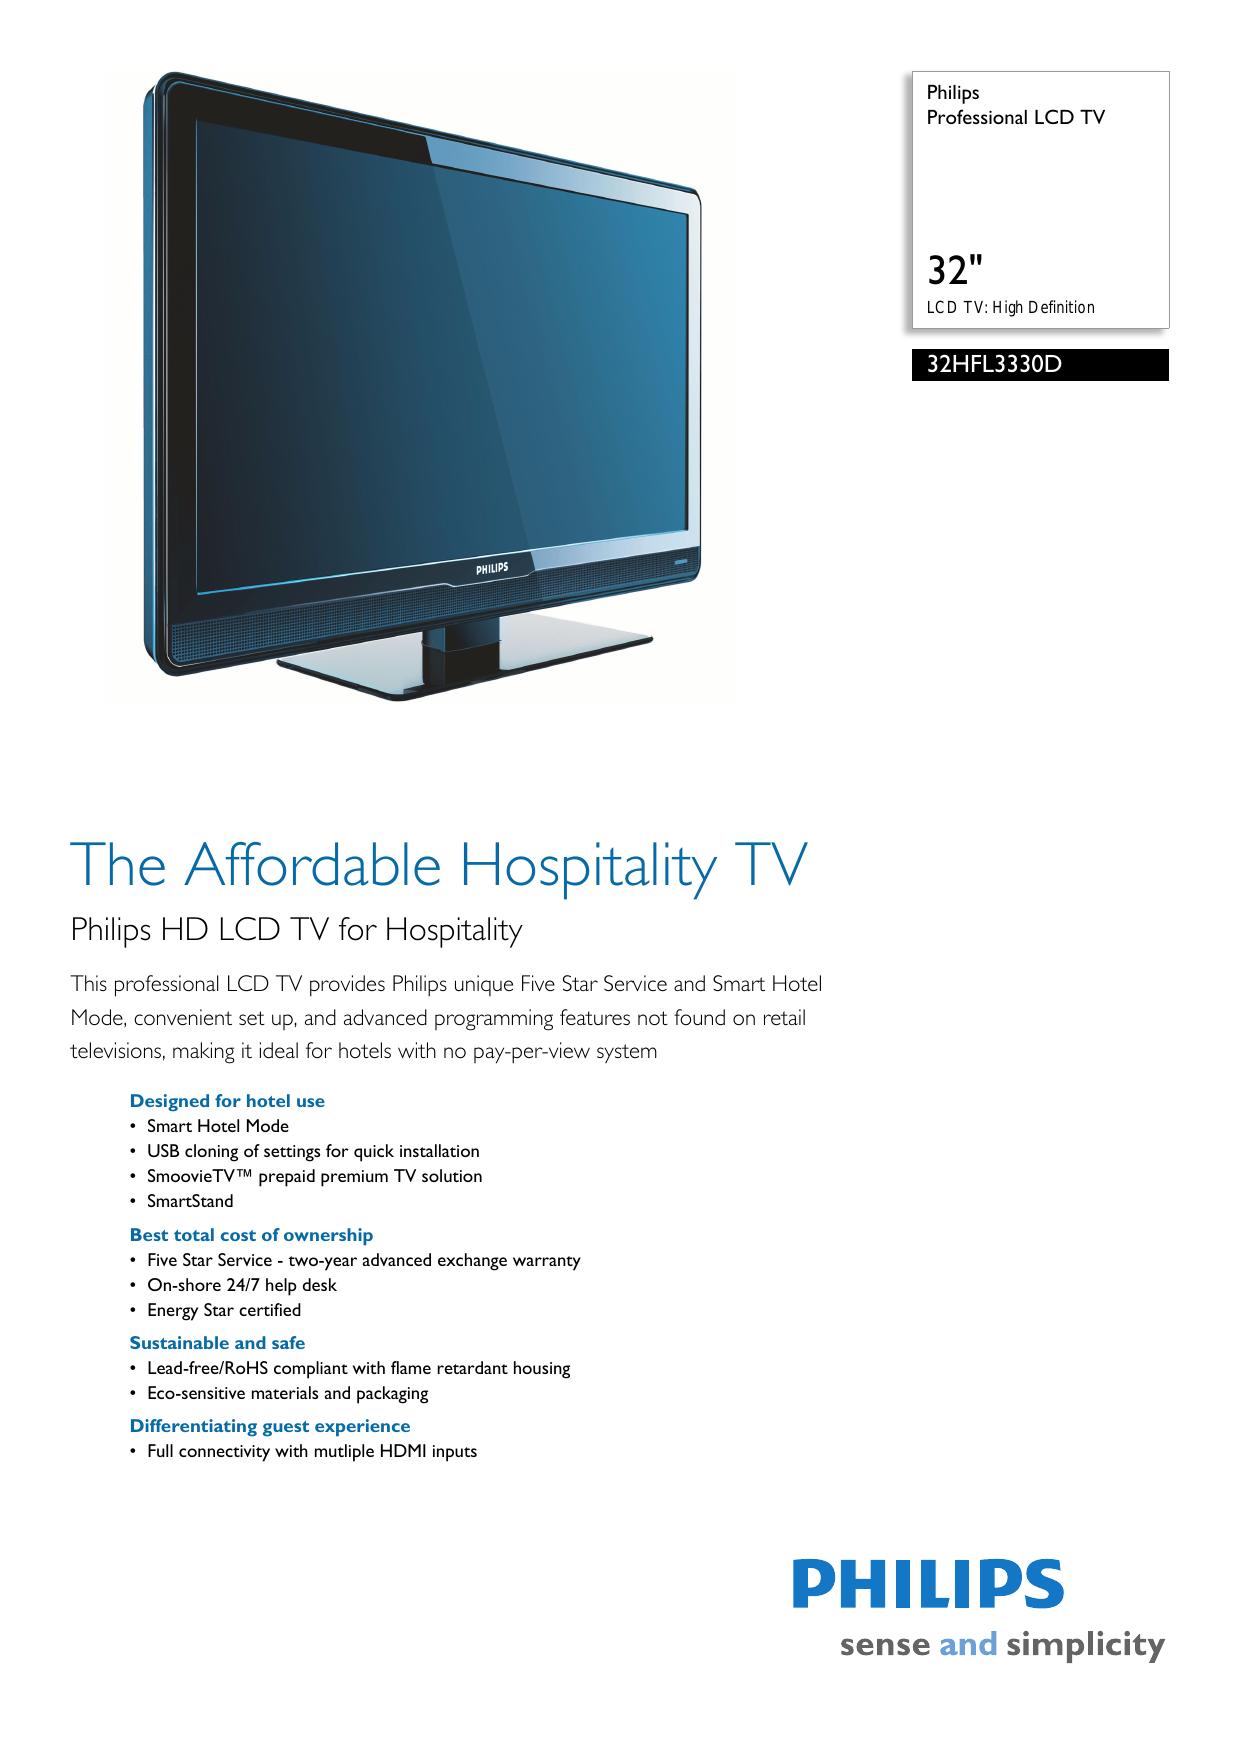 32HFL3330D/27 Philips Professional LCD TV   manualzz com